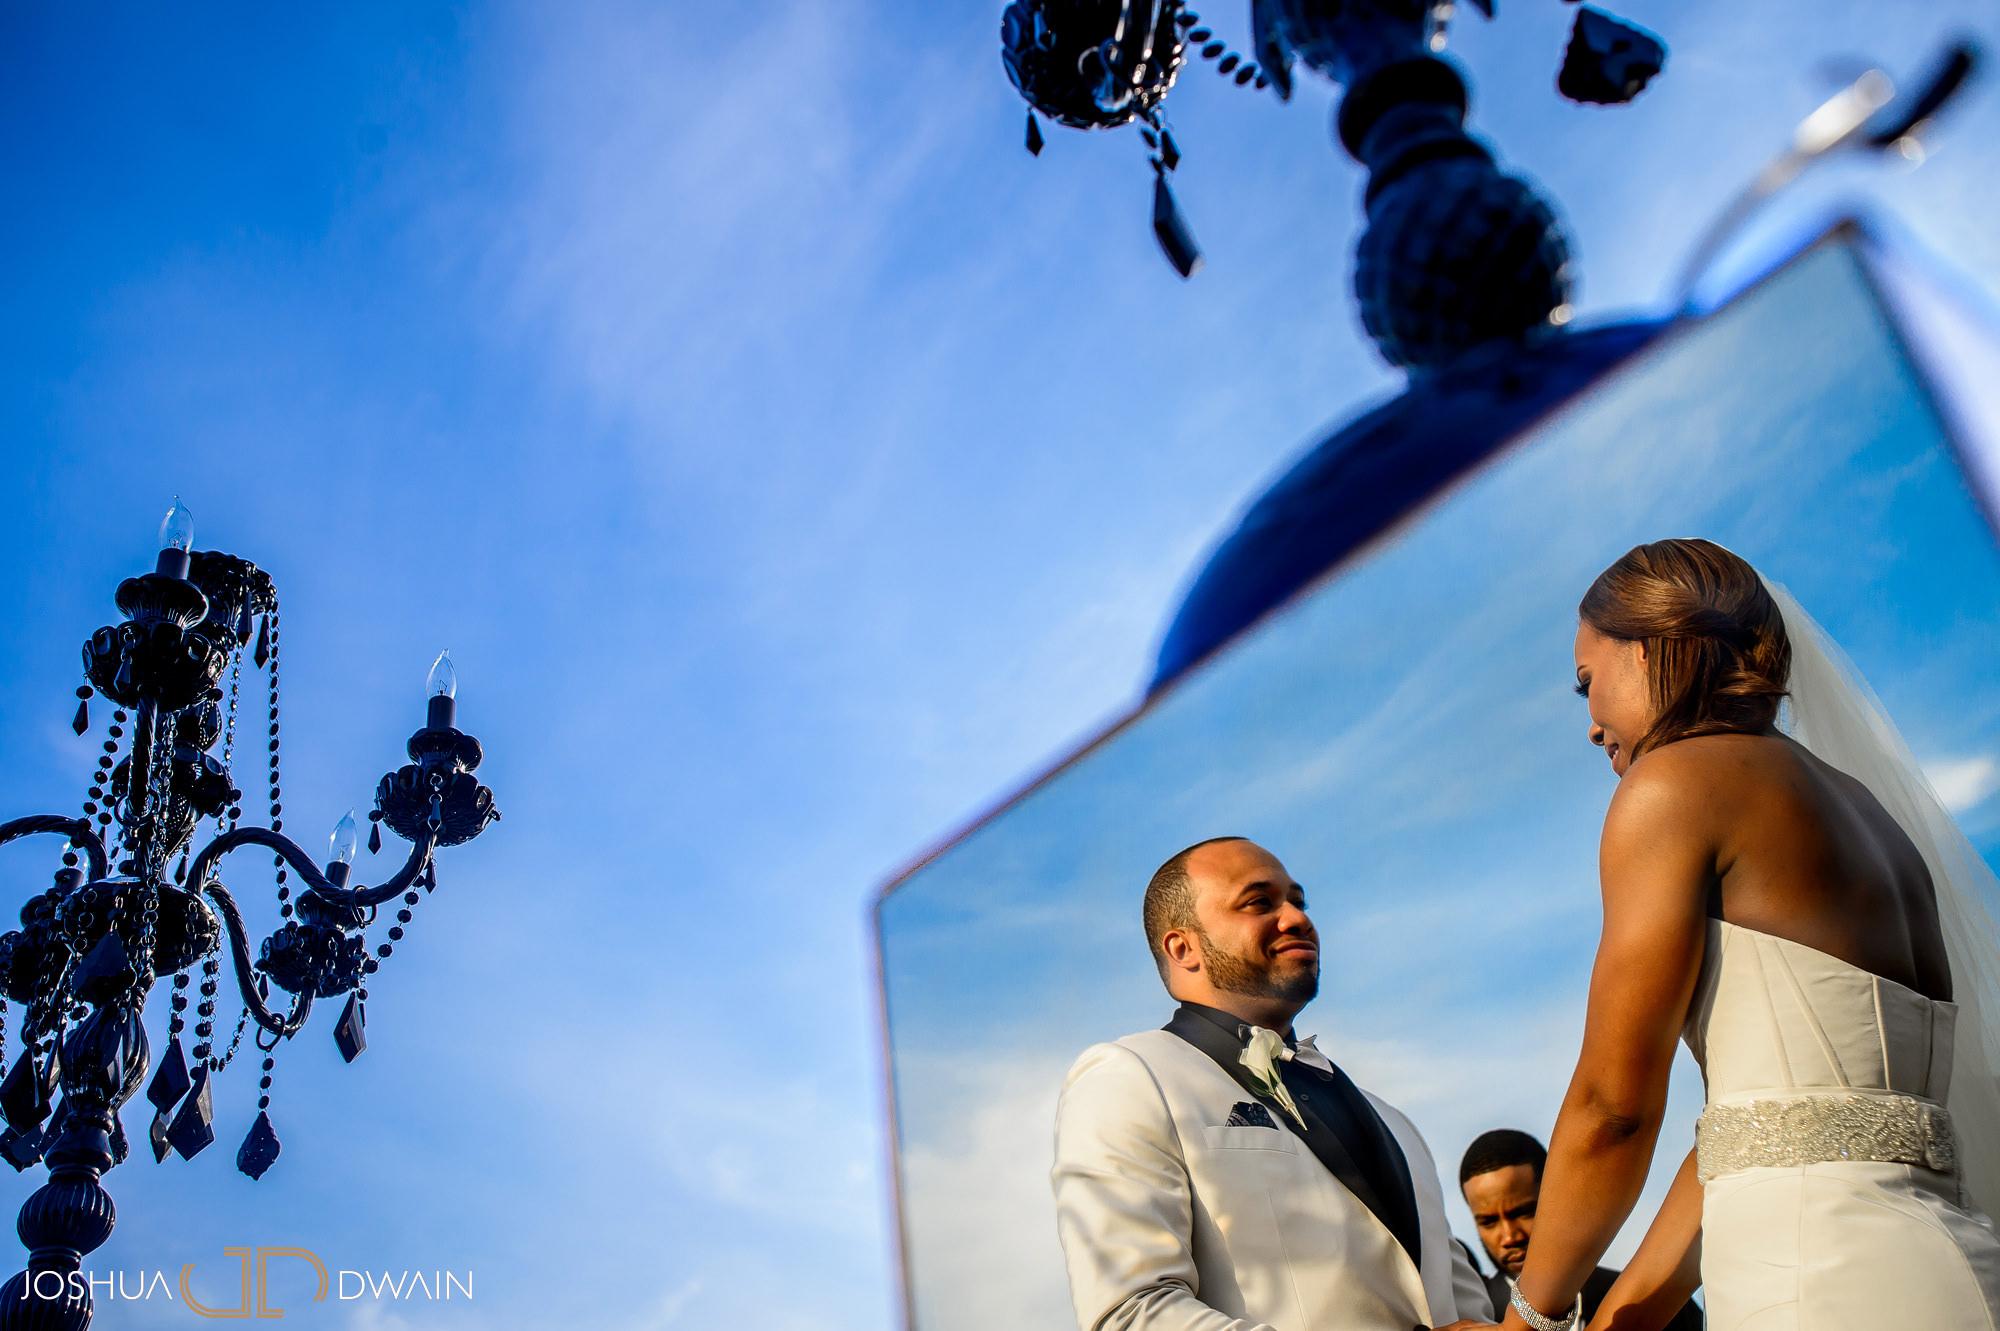 joshua-dwain-weddings-gallery-best-wedding-photographers-us-020